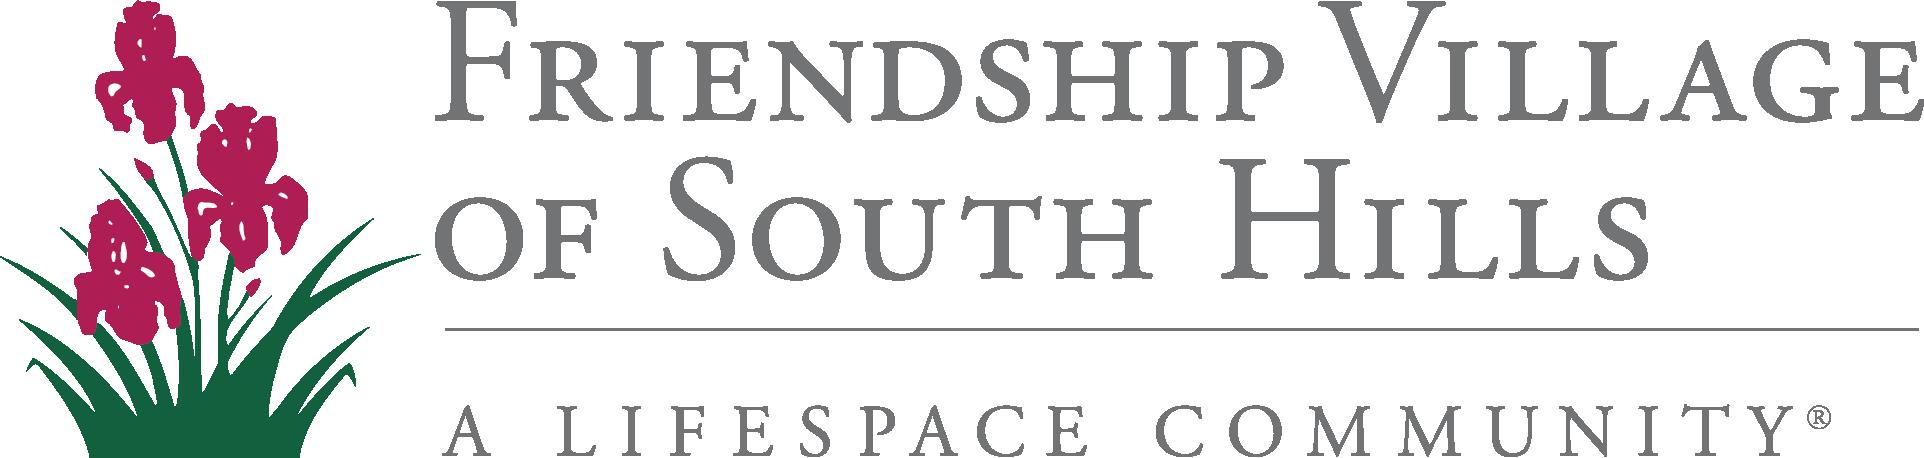 Friendship Village of South Hills